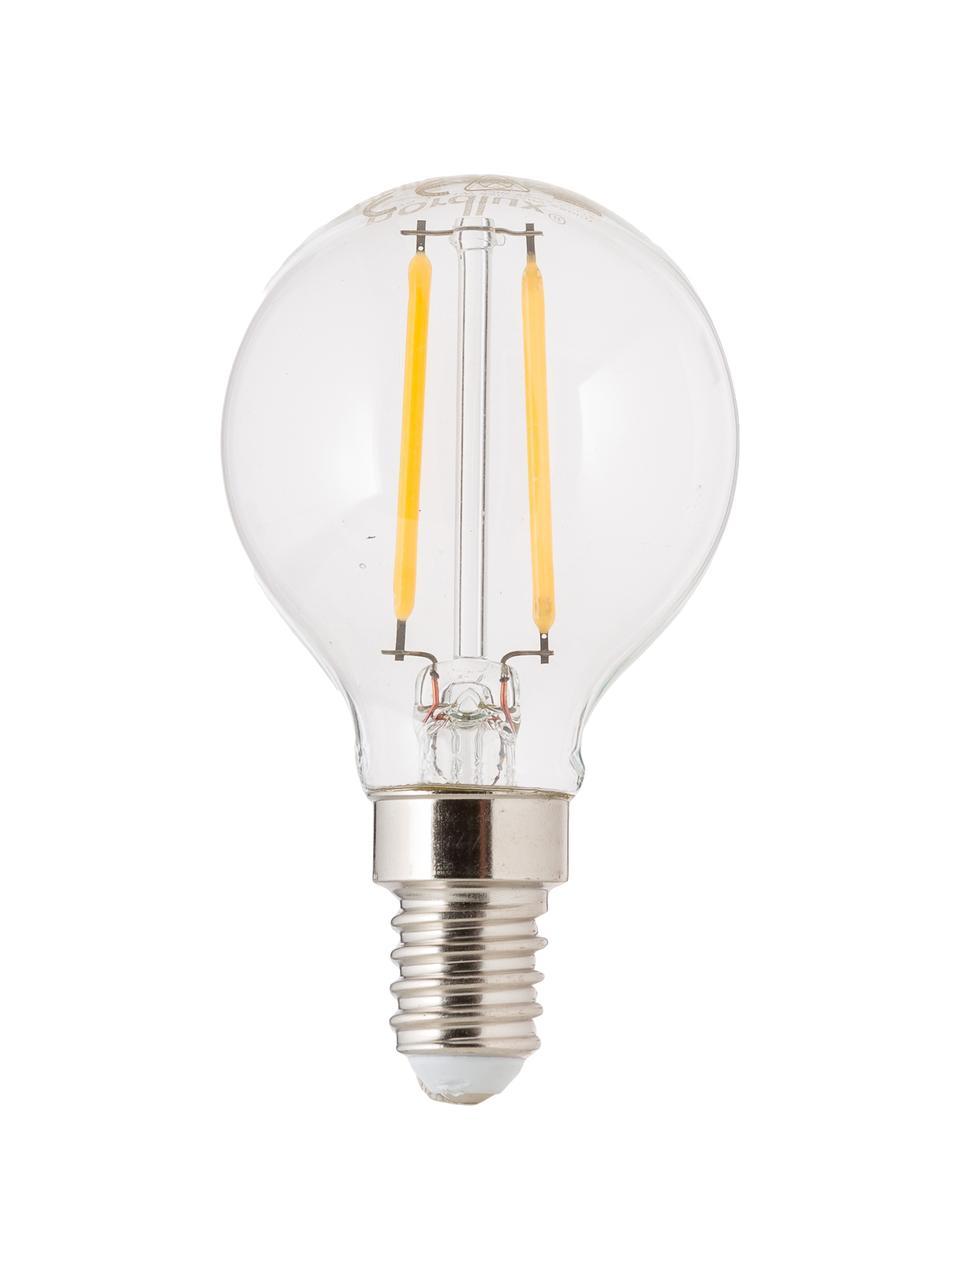 Lampadina E14, 2,5W, bianco caldo, 5 pz, Paralume: vetro, Base lampadina: alluminio, Trasparente, Ø 5 x Alt. 8 cm